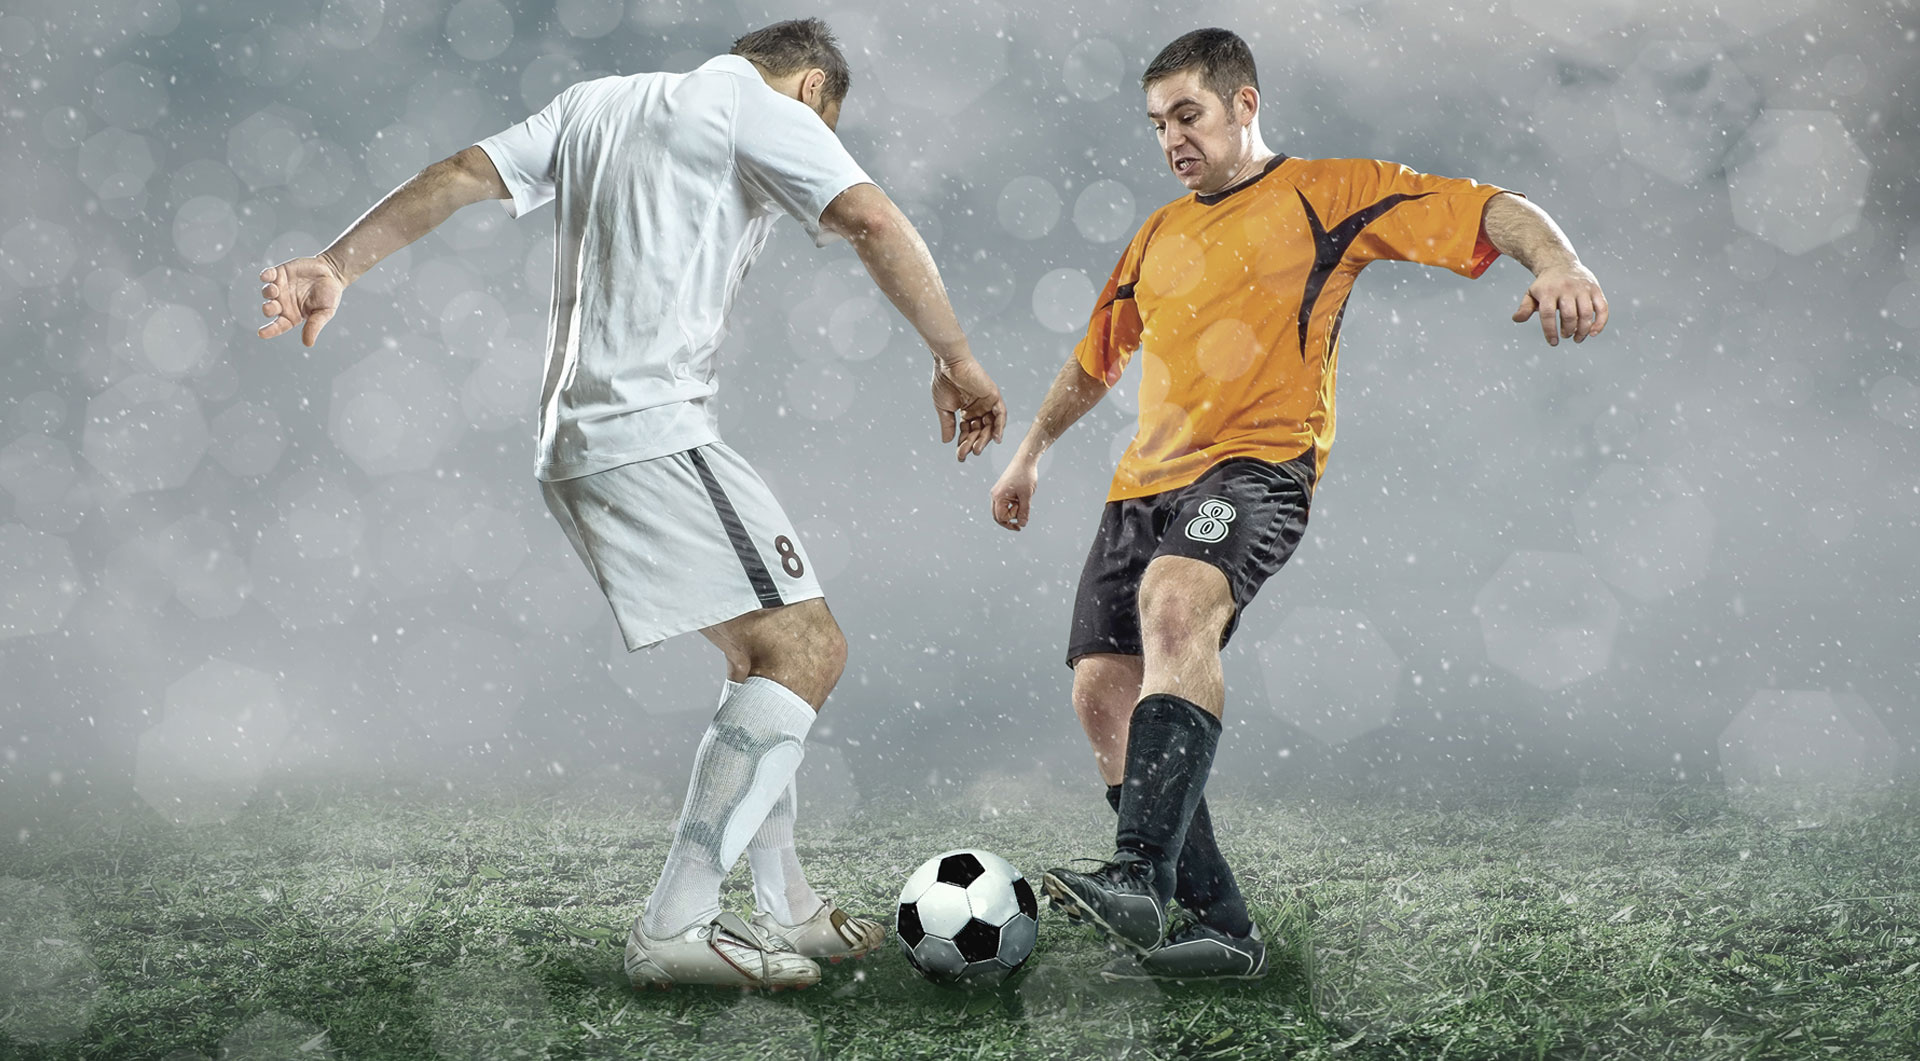 watch-andrey-kuznetsov-vs-andy-murray-us-open-round-3-online